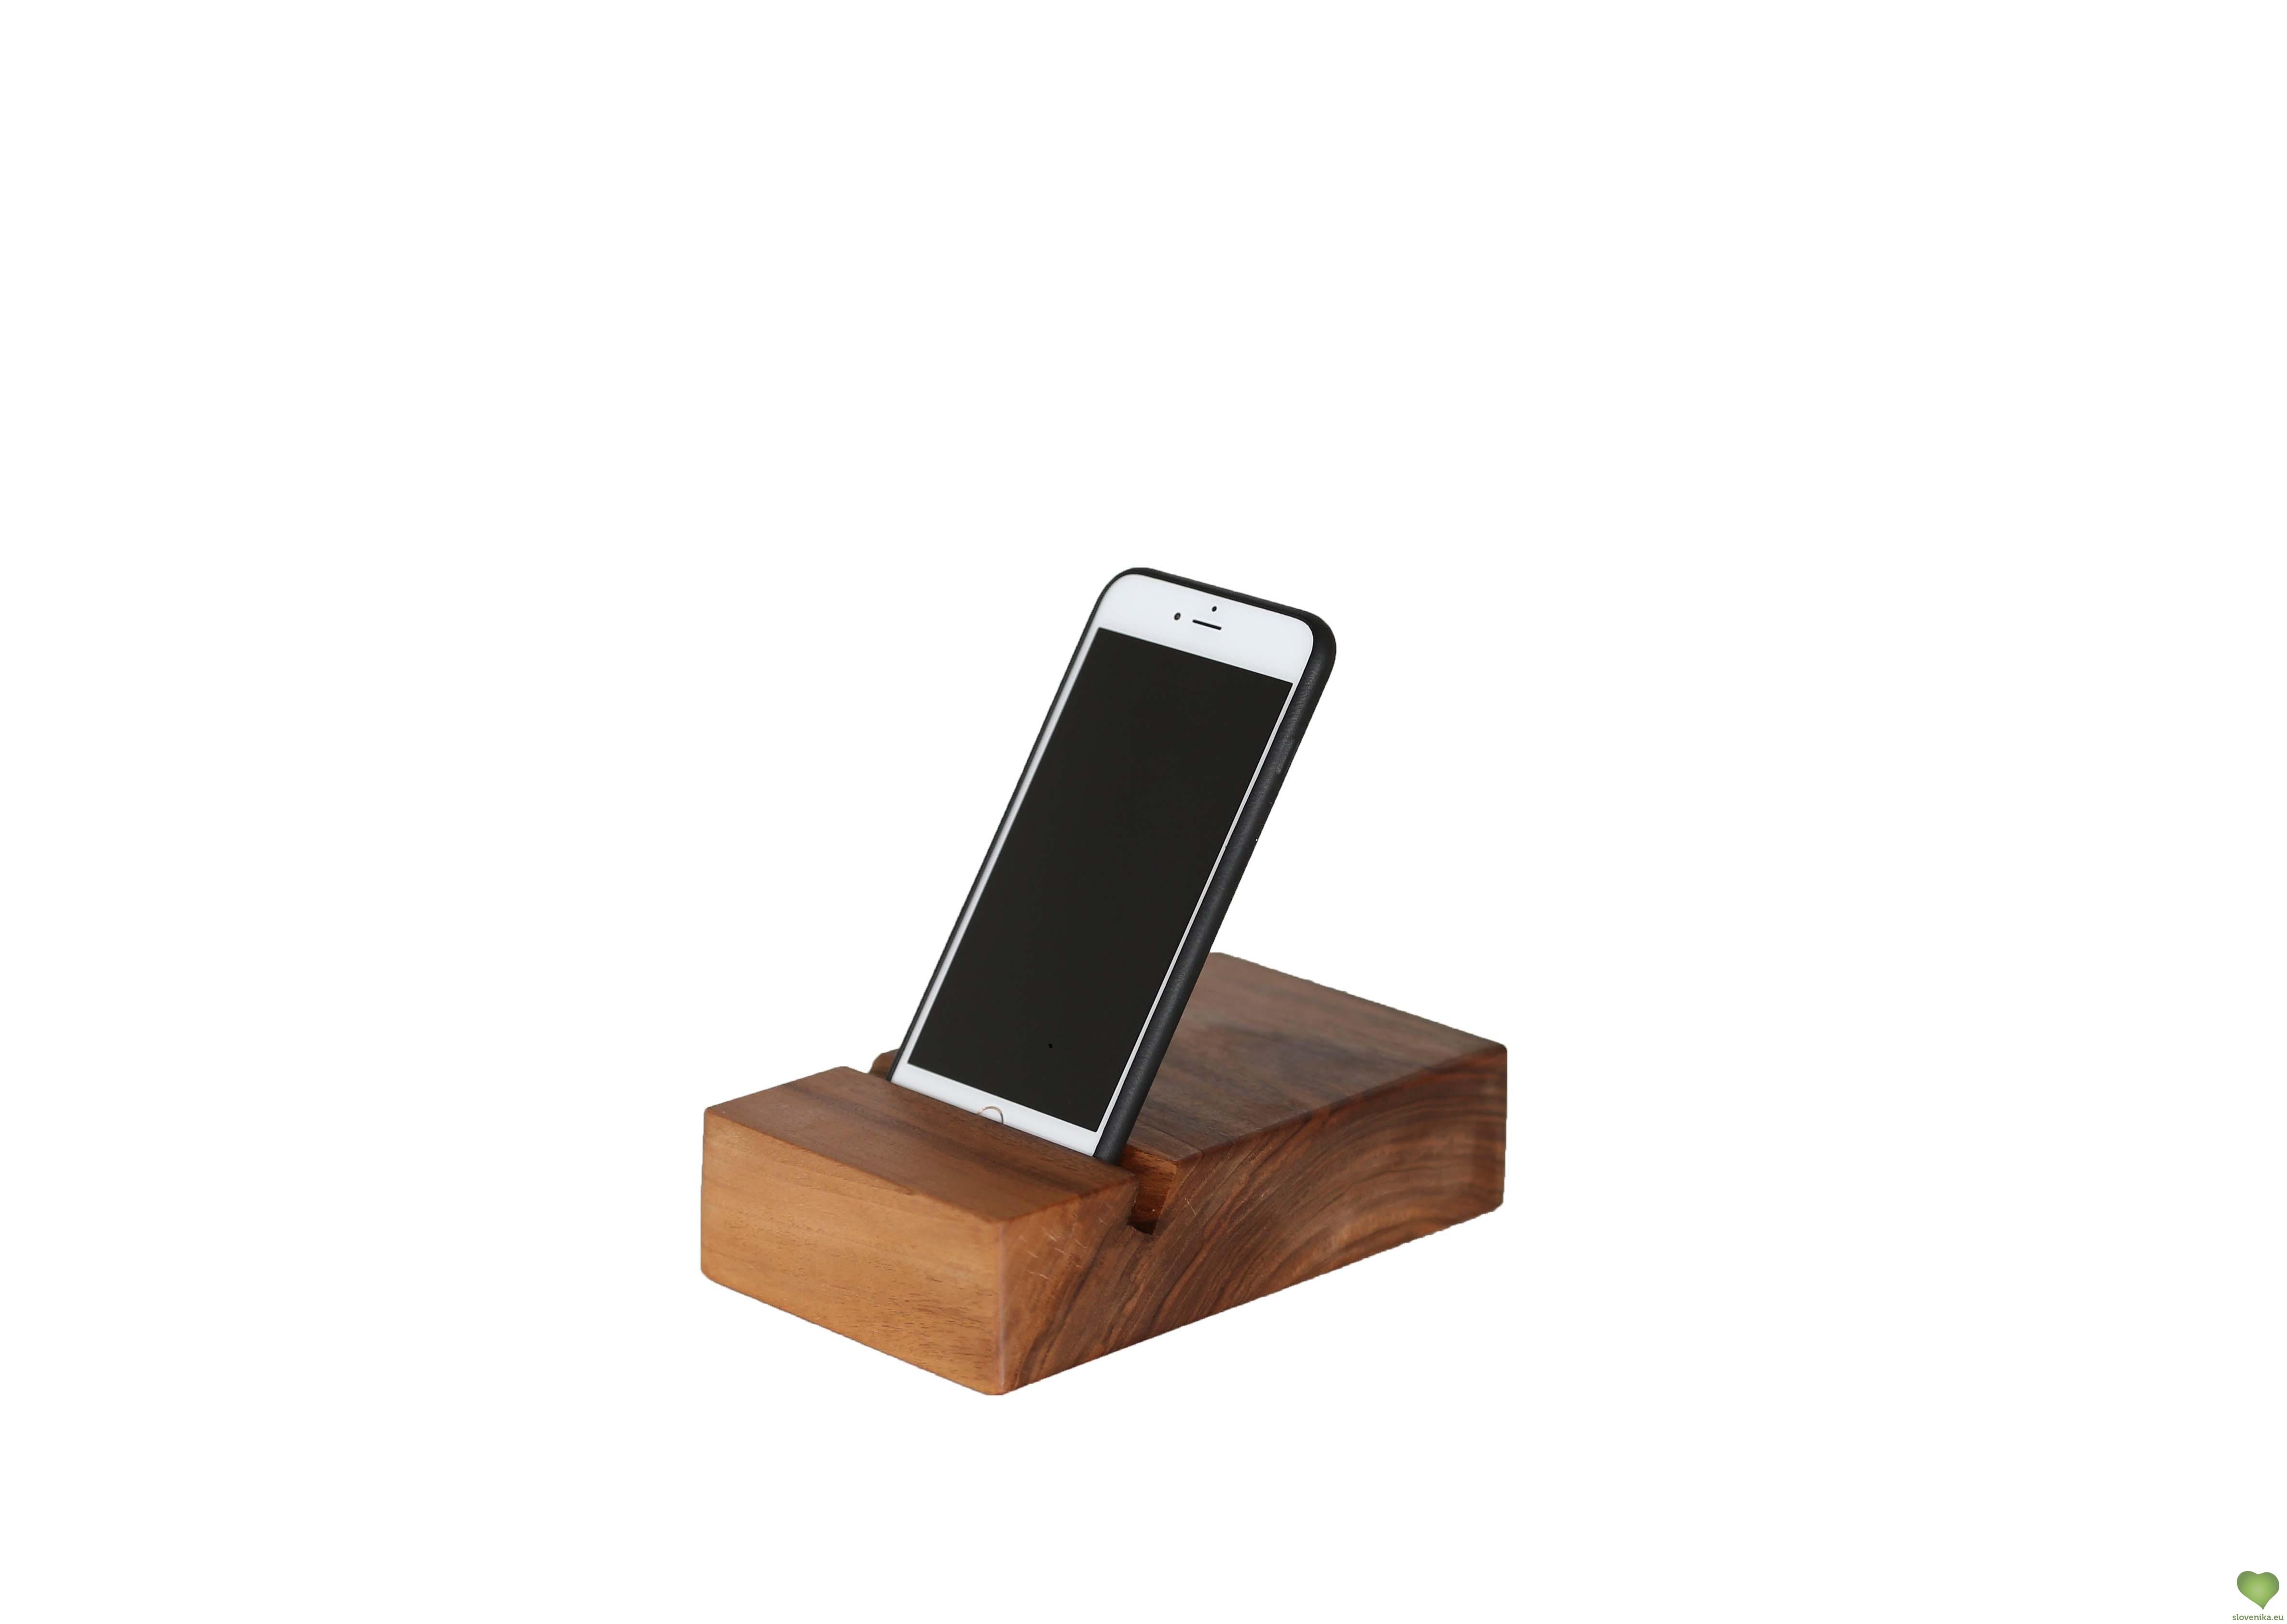 KISIK: LESENA MIZA ZA TELEFONE ALI TABLICE